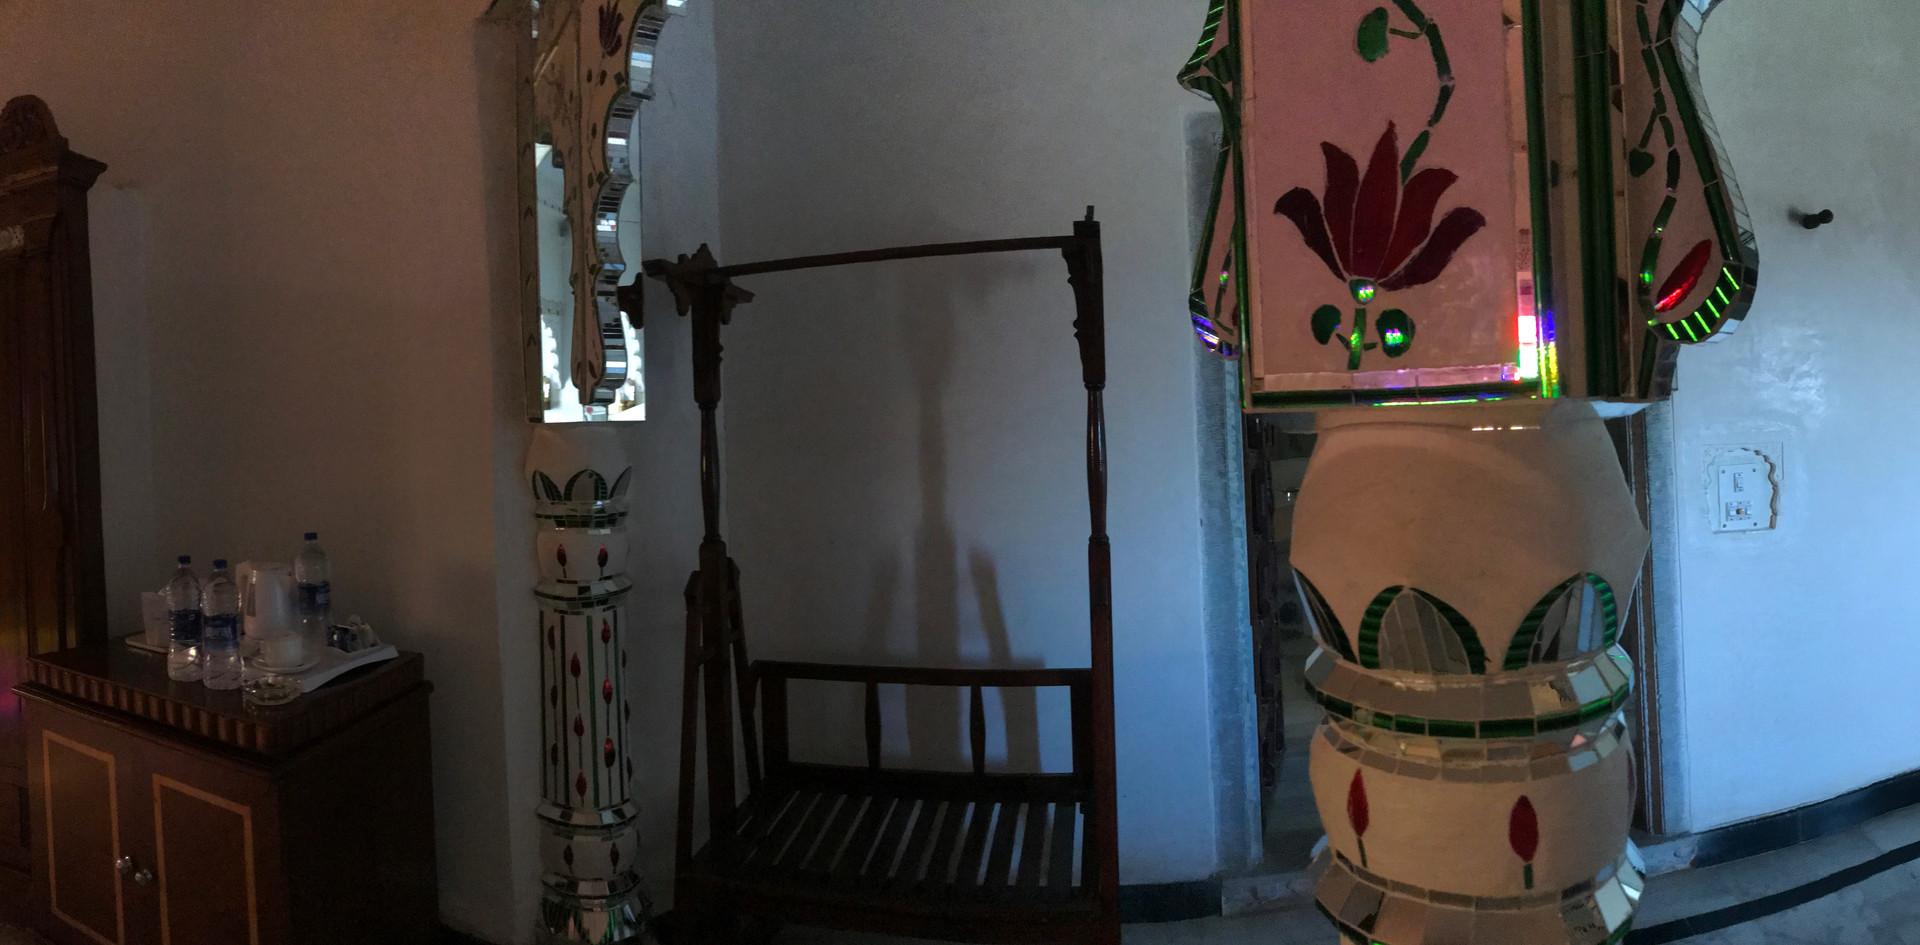 PANORAMA-RAJASTHAN-HERITAGE-ROOM-COLOURE